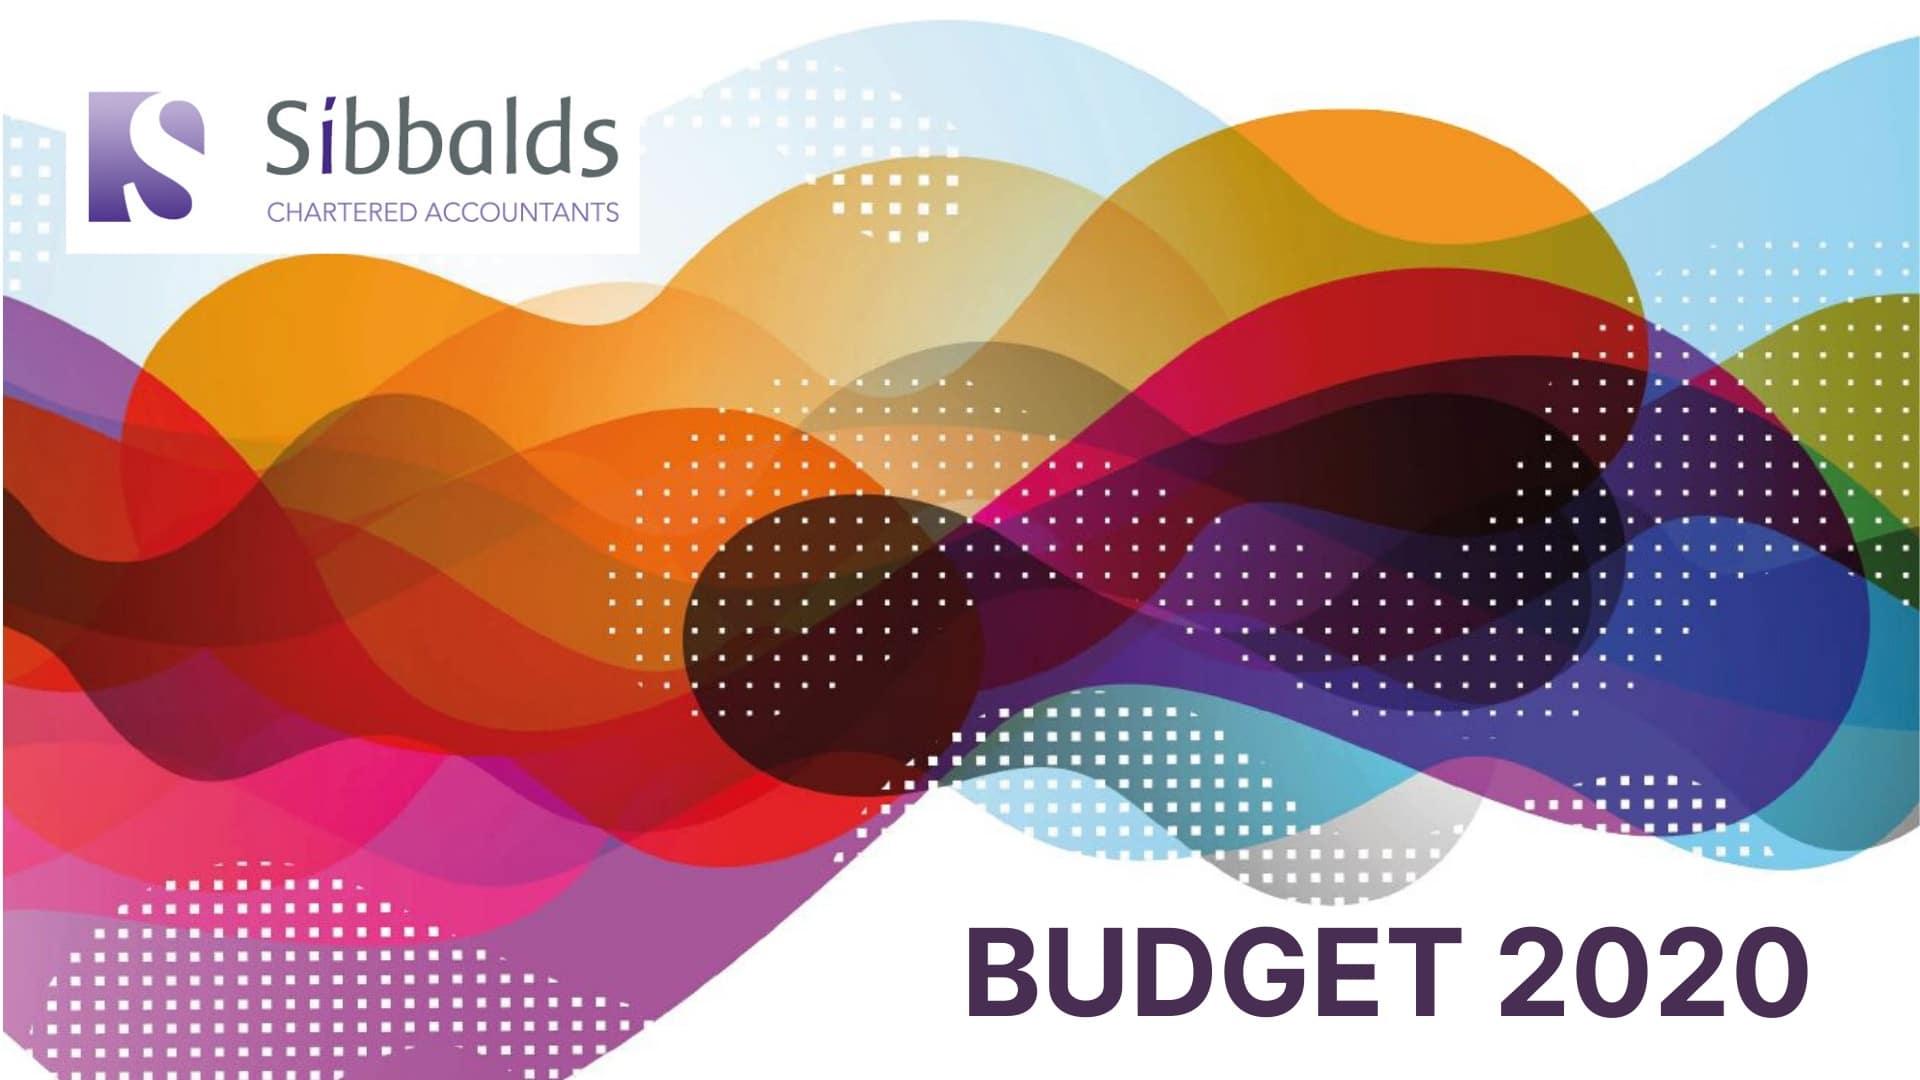 sibbalds budget summary 2020